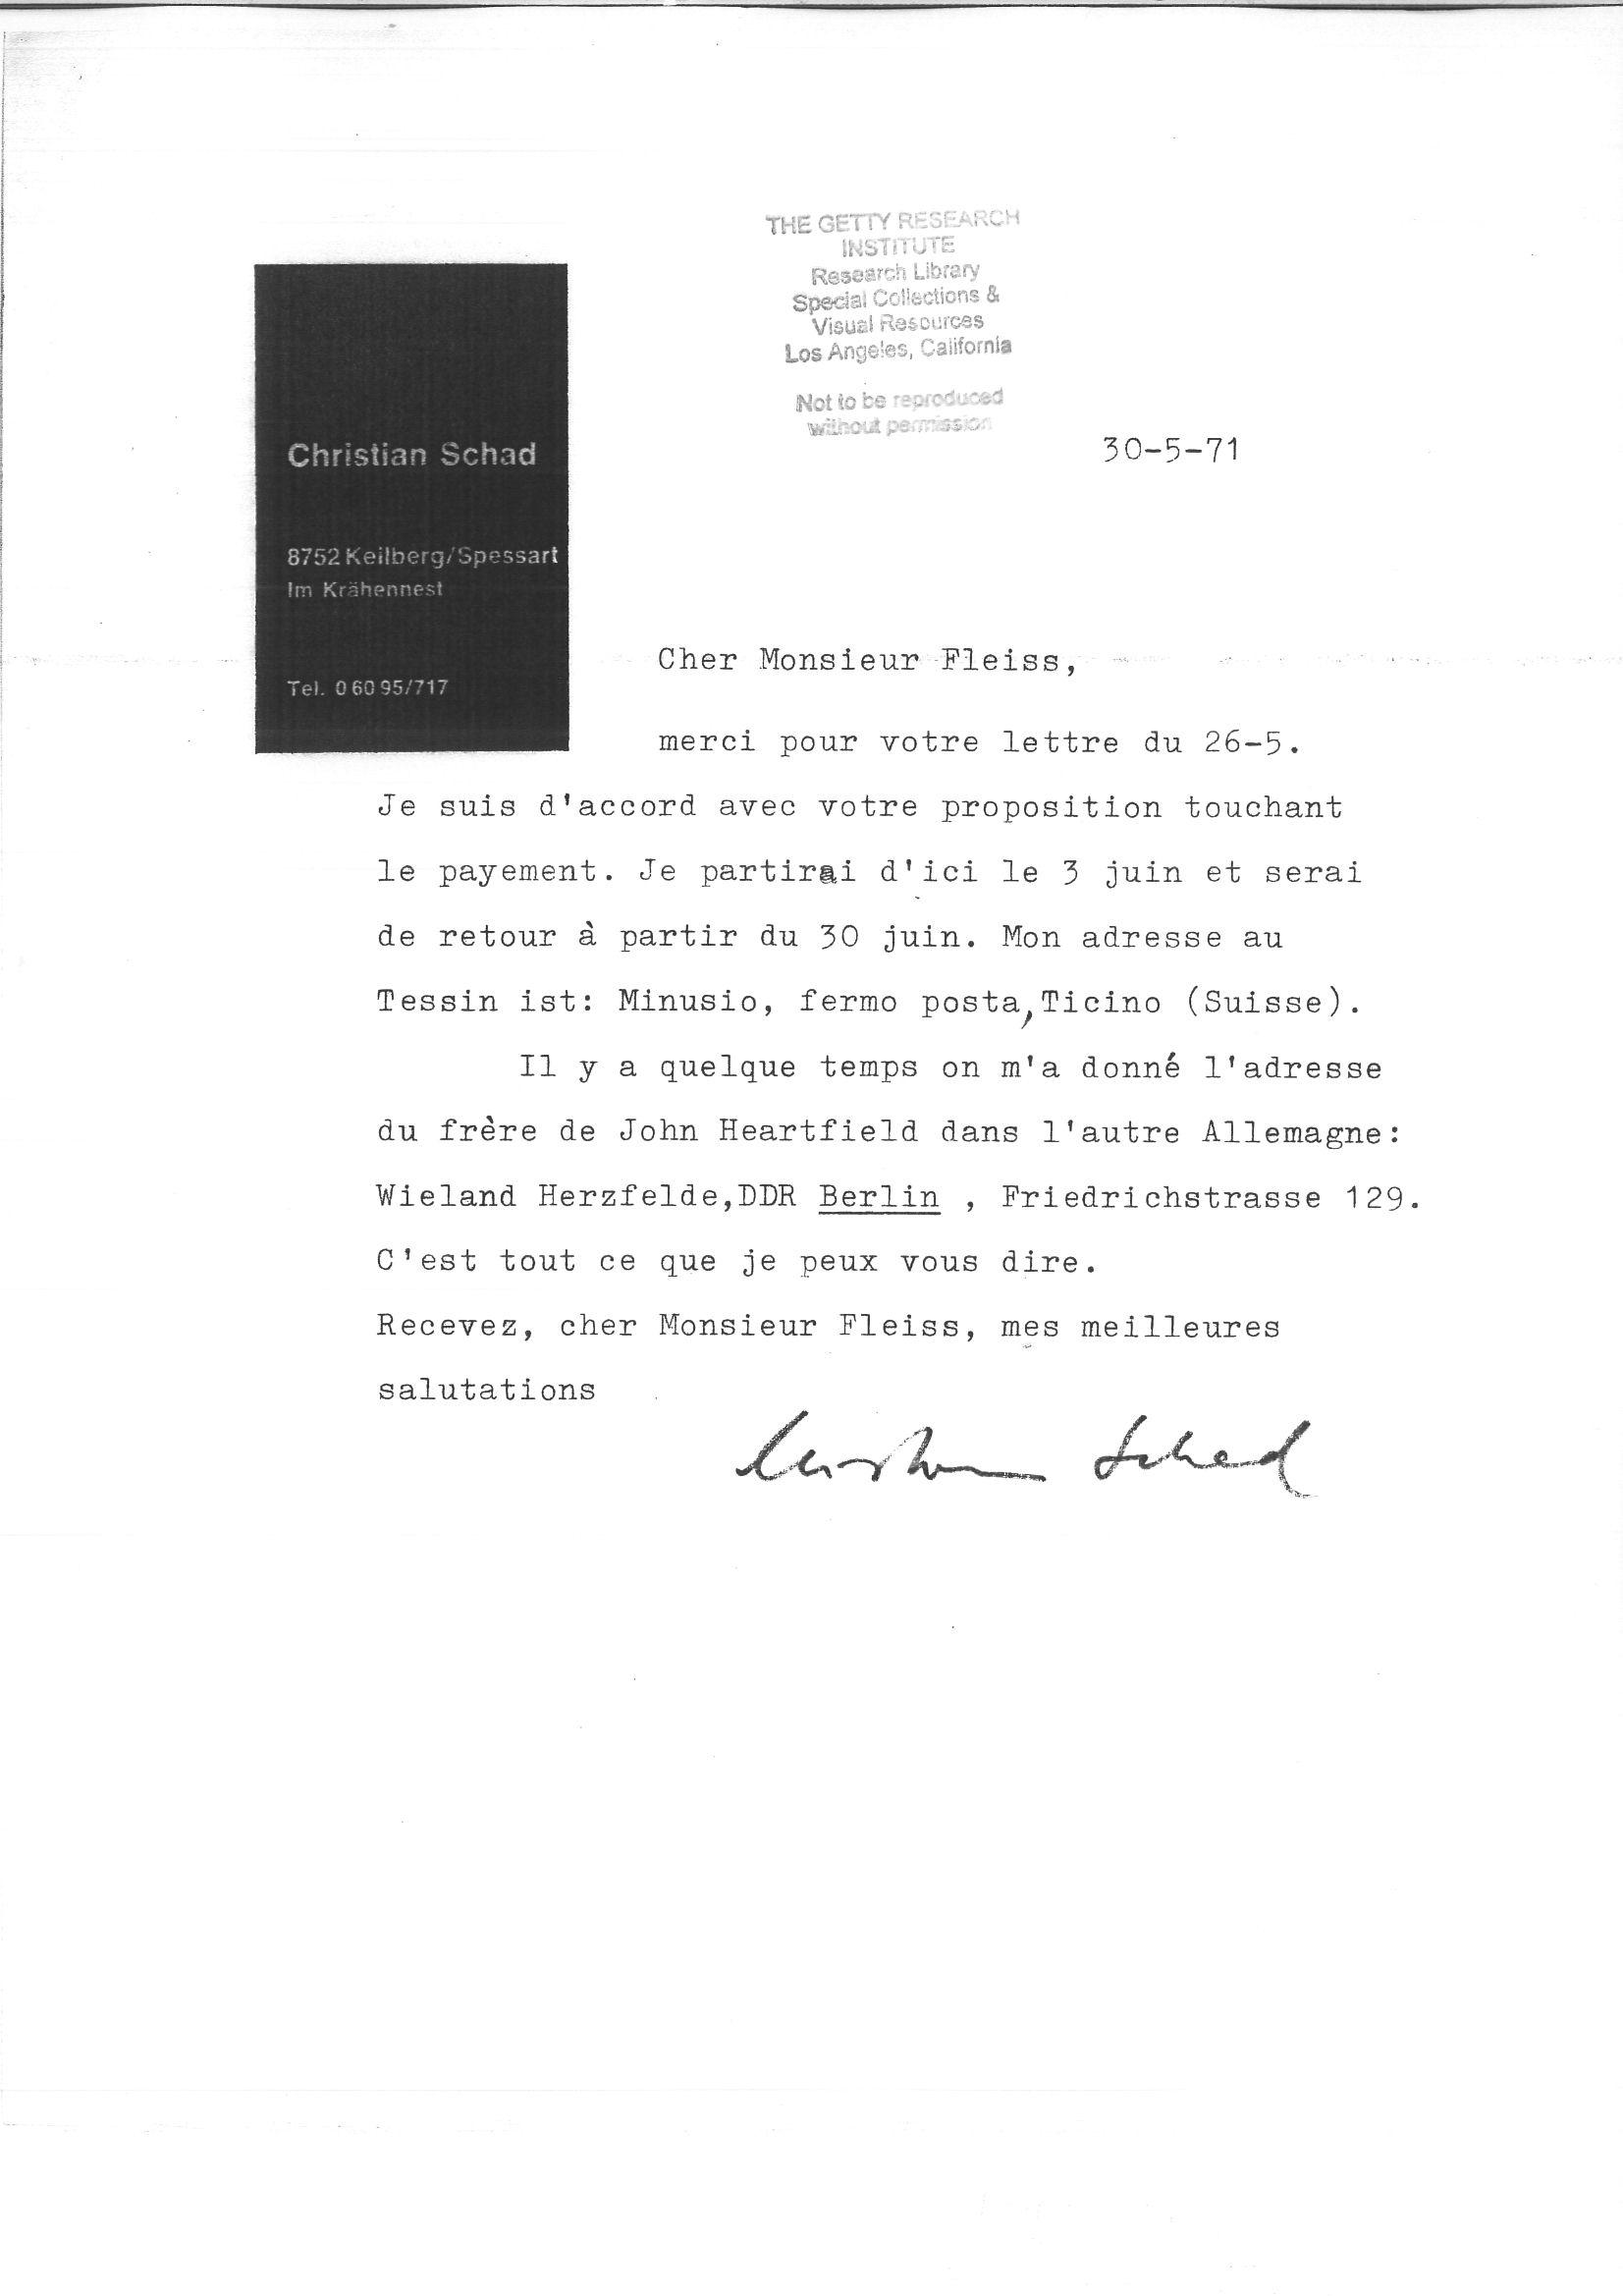 1-4-Christian-Schad-Correspondance-du-30-5-71